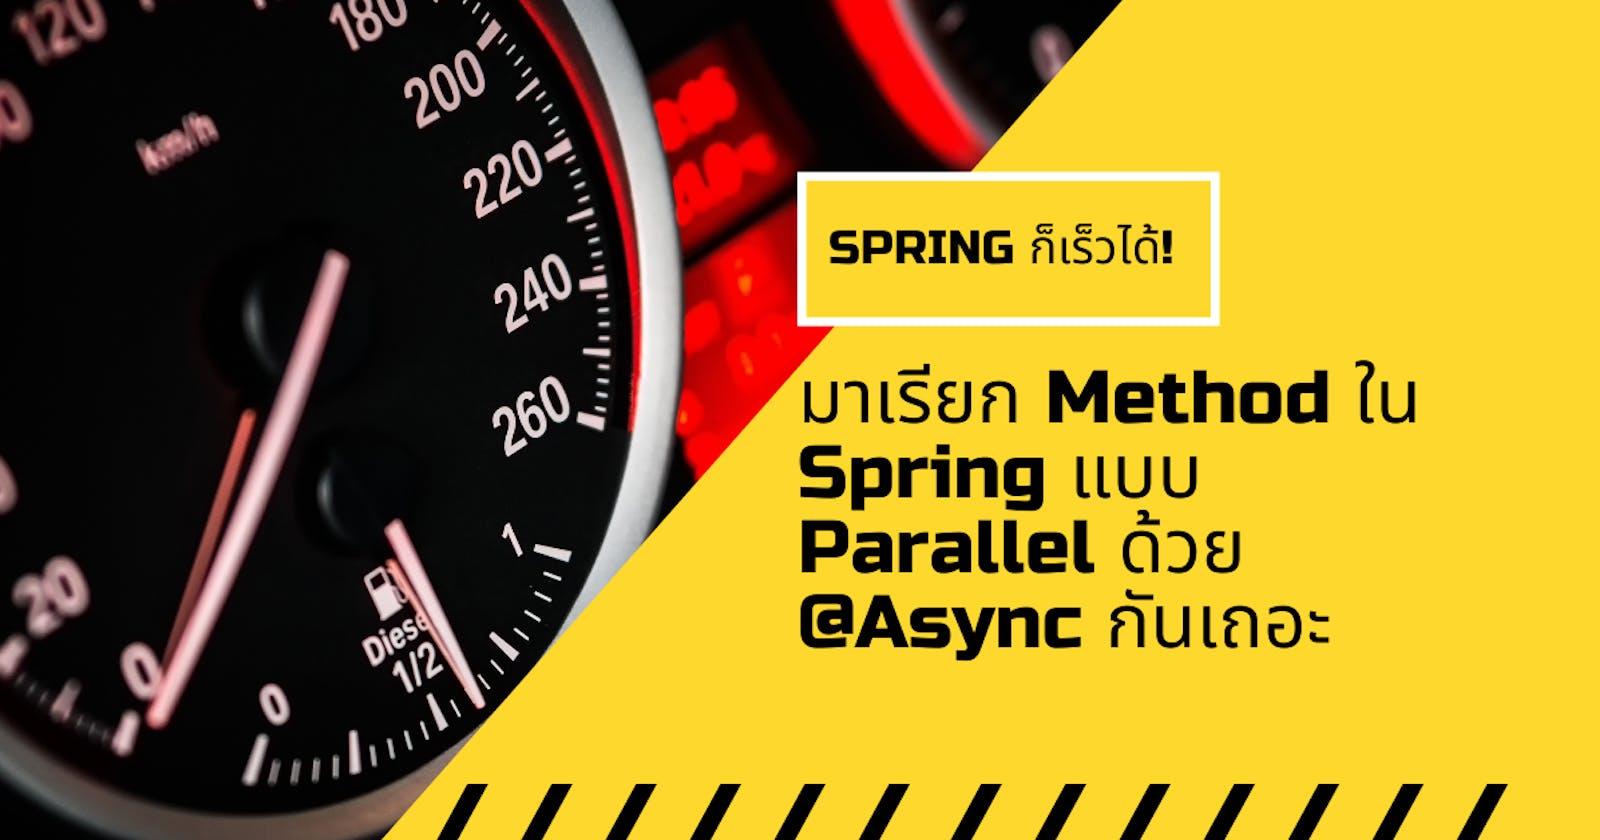 Spring ก็เร็วได้! มาเรียก Method ใน Spring แบบ Parallel ด้วย @Async กันเถอะ